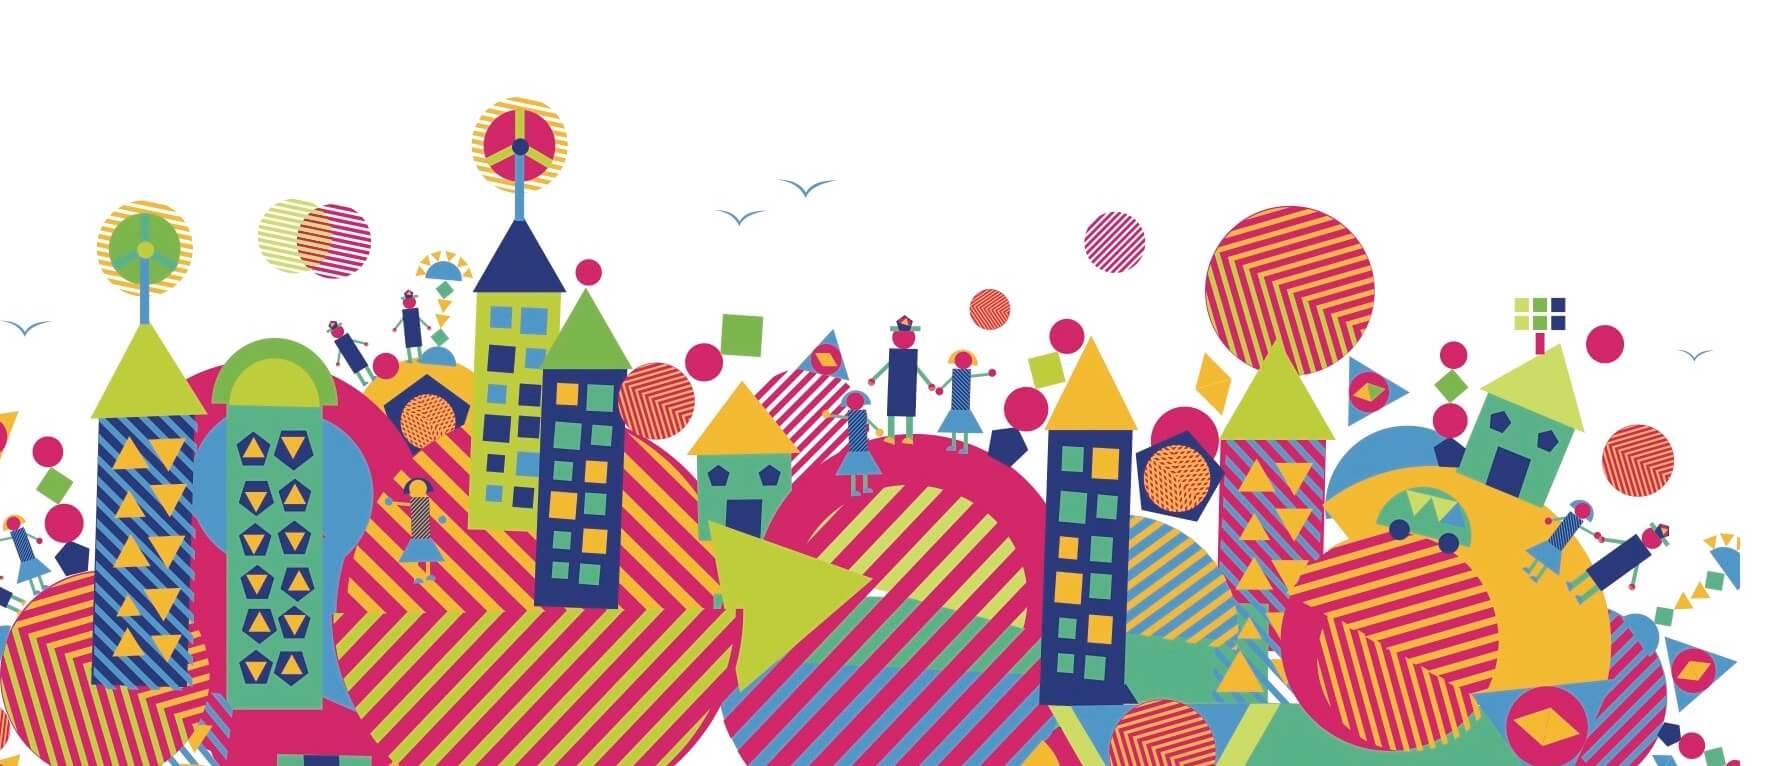 Vibrantly coloured design of community engagement